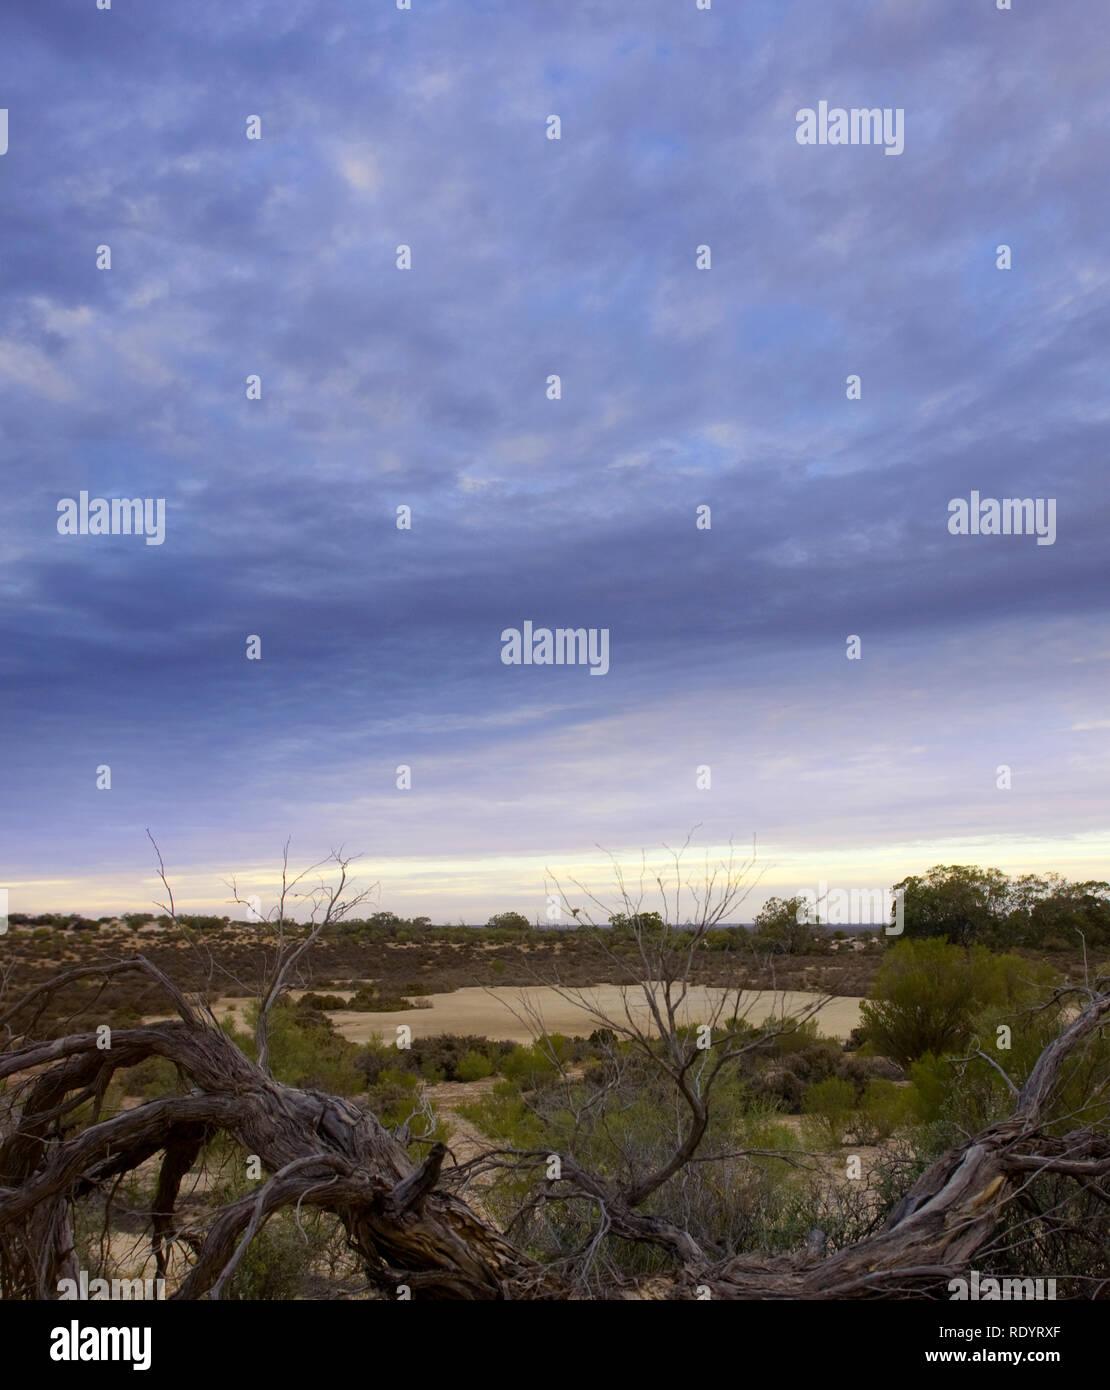 Emu Lake in drought, Menindee, New South Wales, Australia - Stock Image